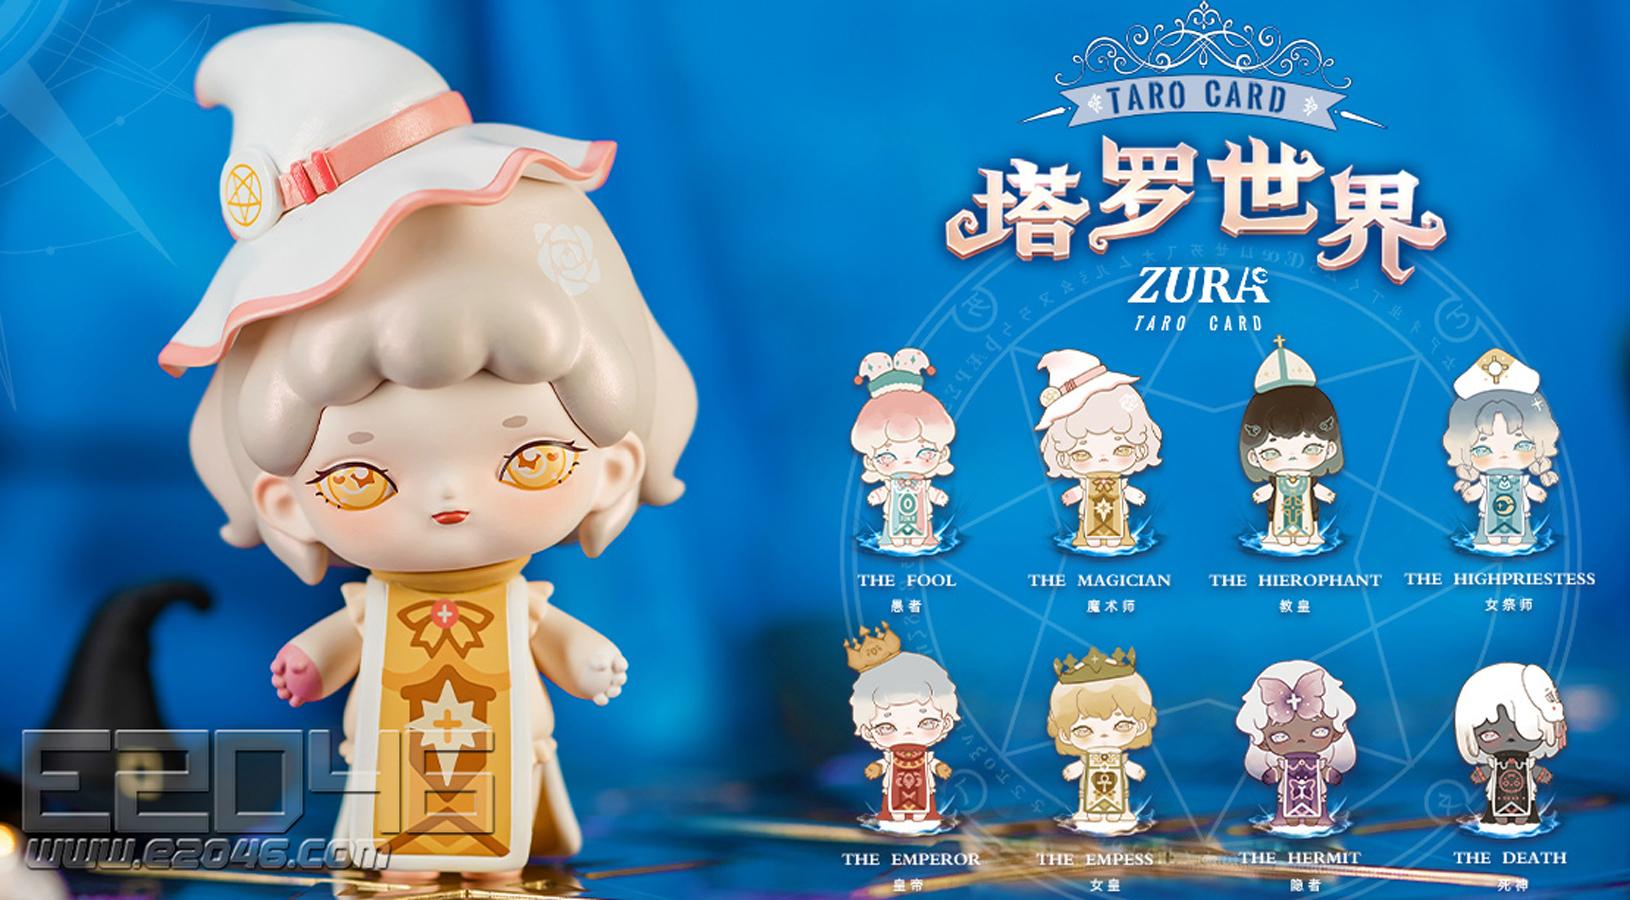 Zulataro series